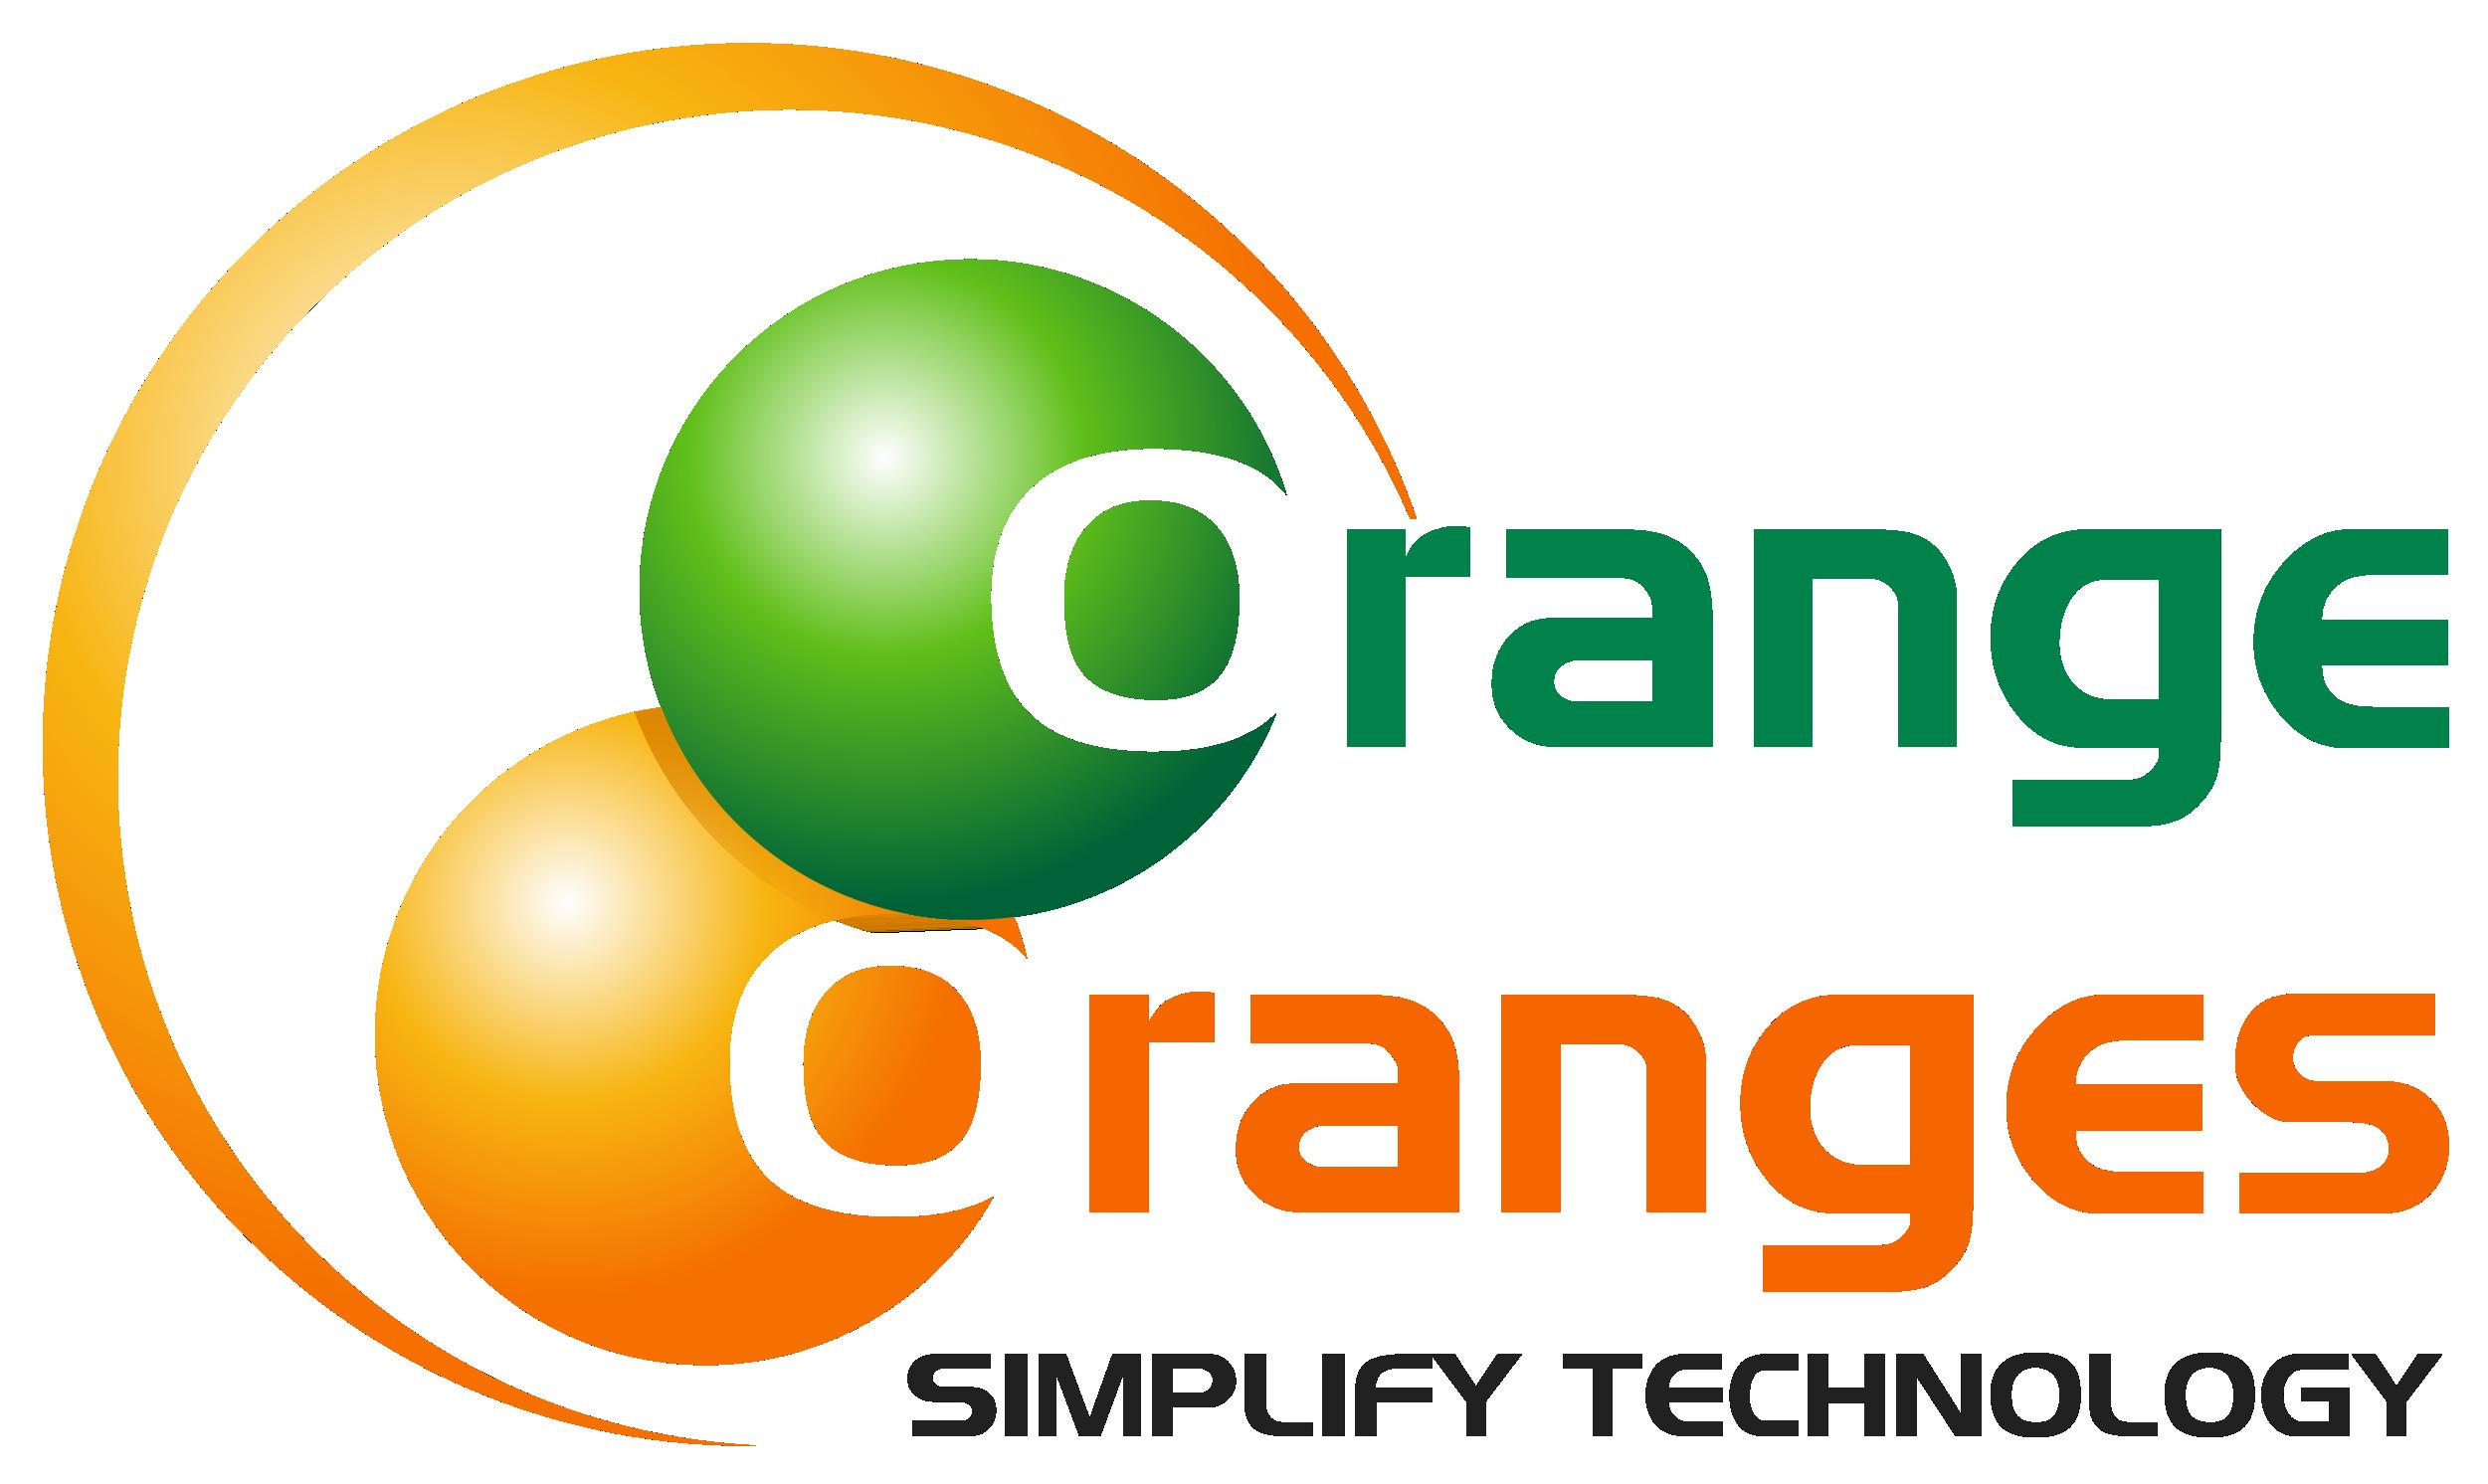 Orange Oranges Technologies Ltd